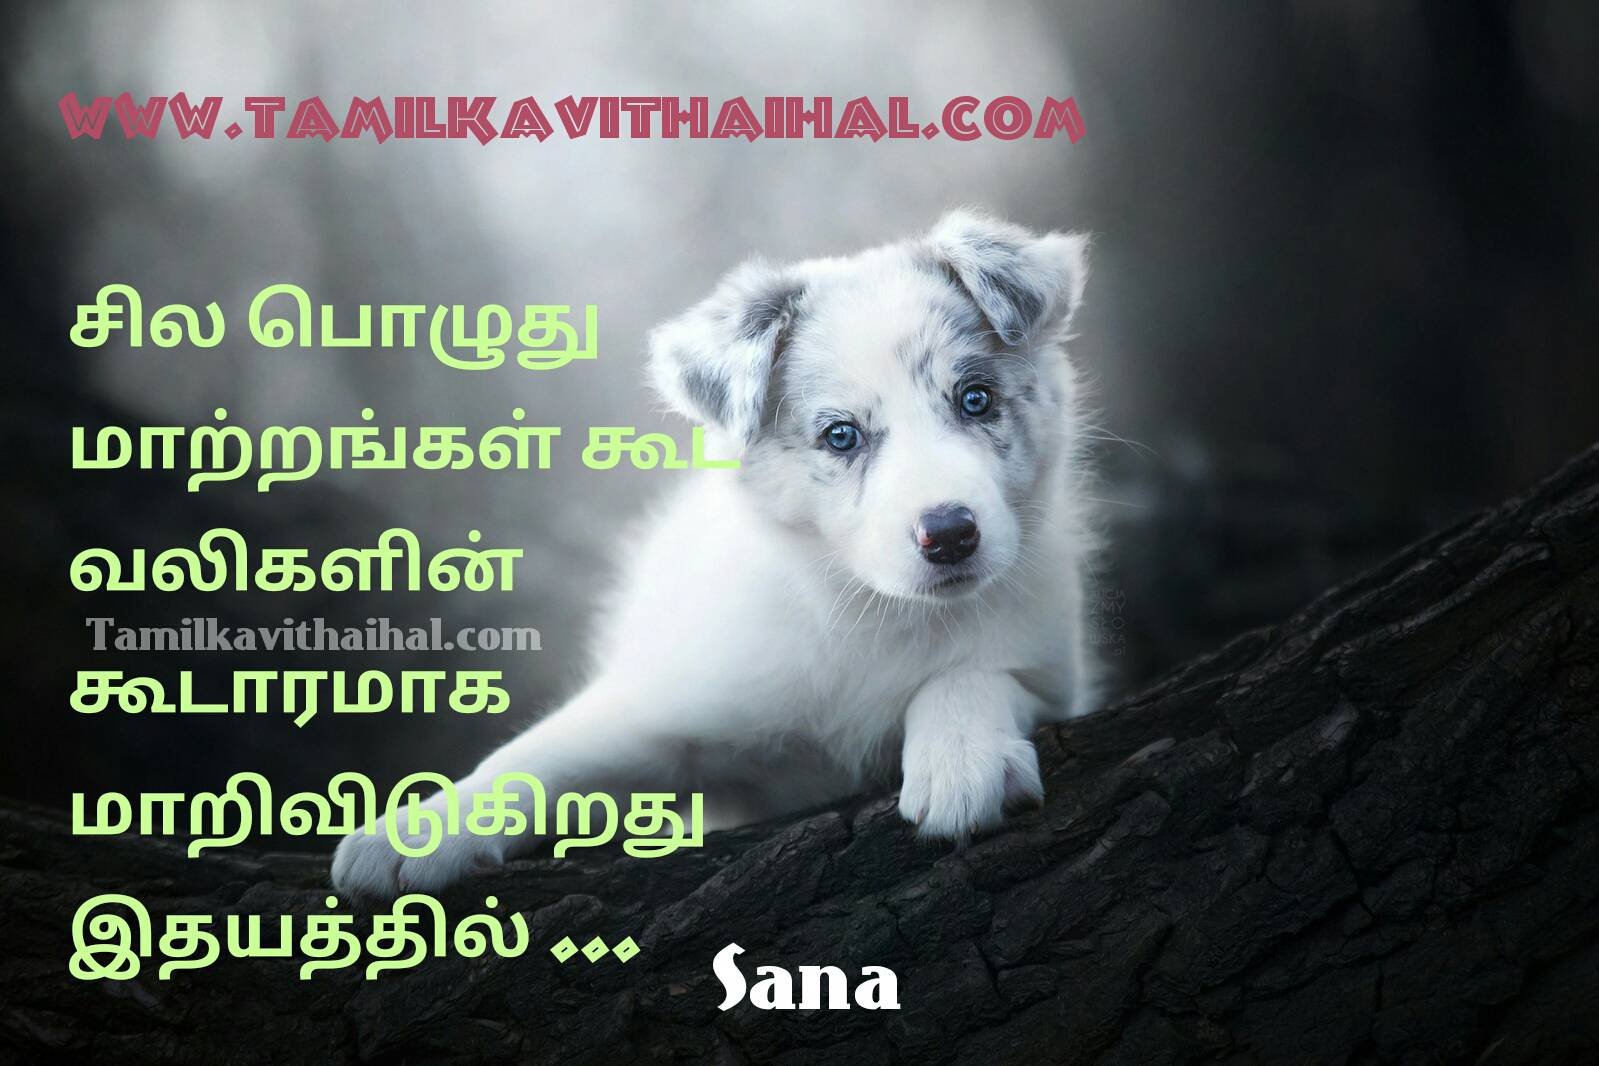 Best Tamil Thathuvam Maatram Vali Valkkai Idhyam Positive Life